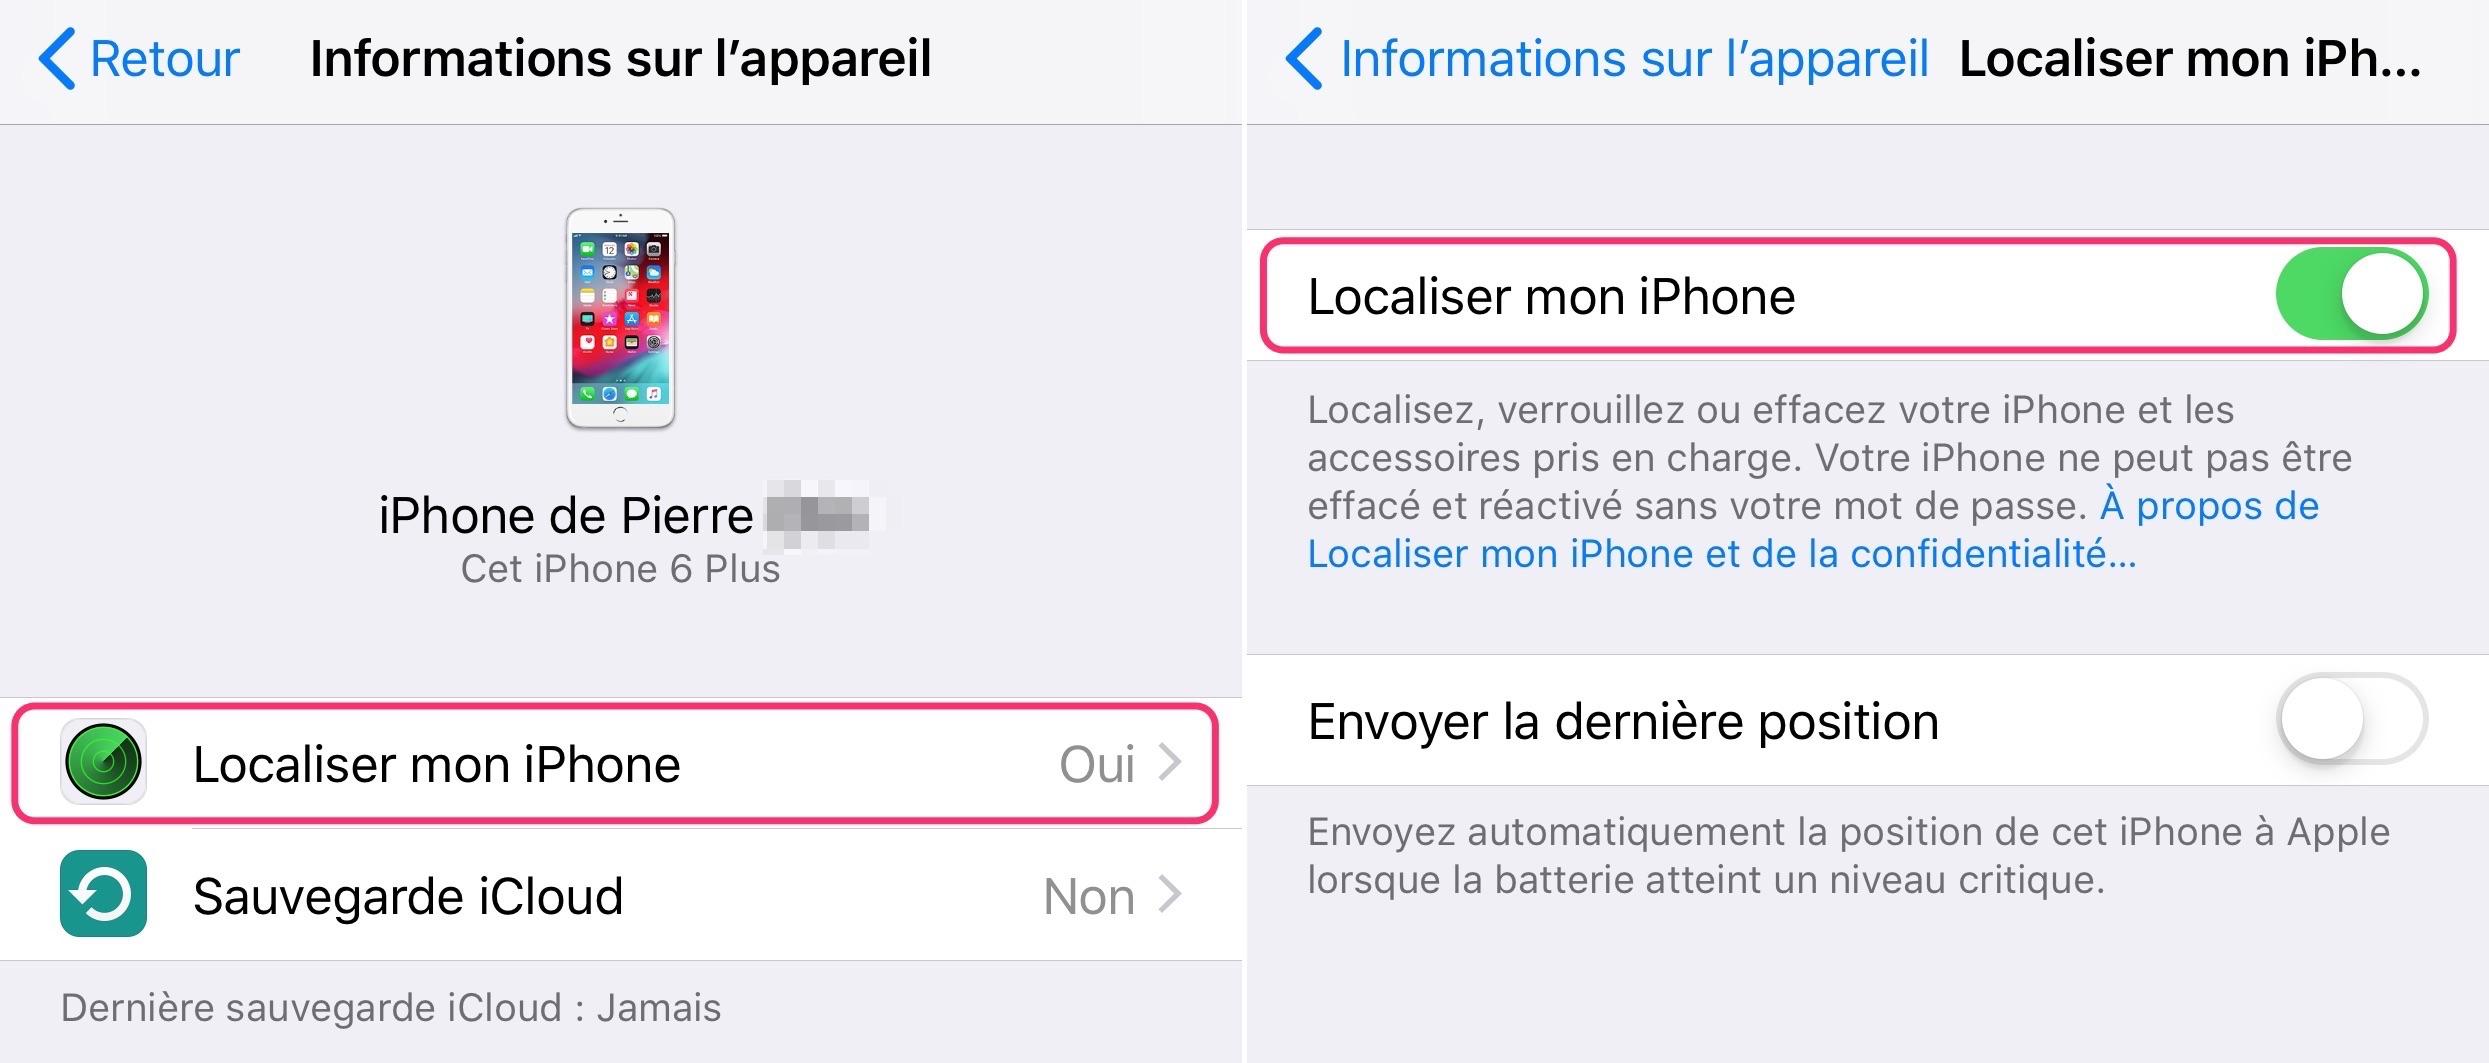 Sauvegarder son iPhone sur iCloud